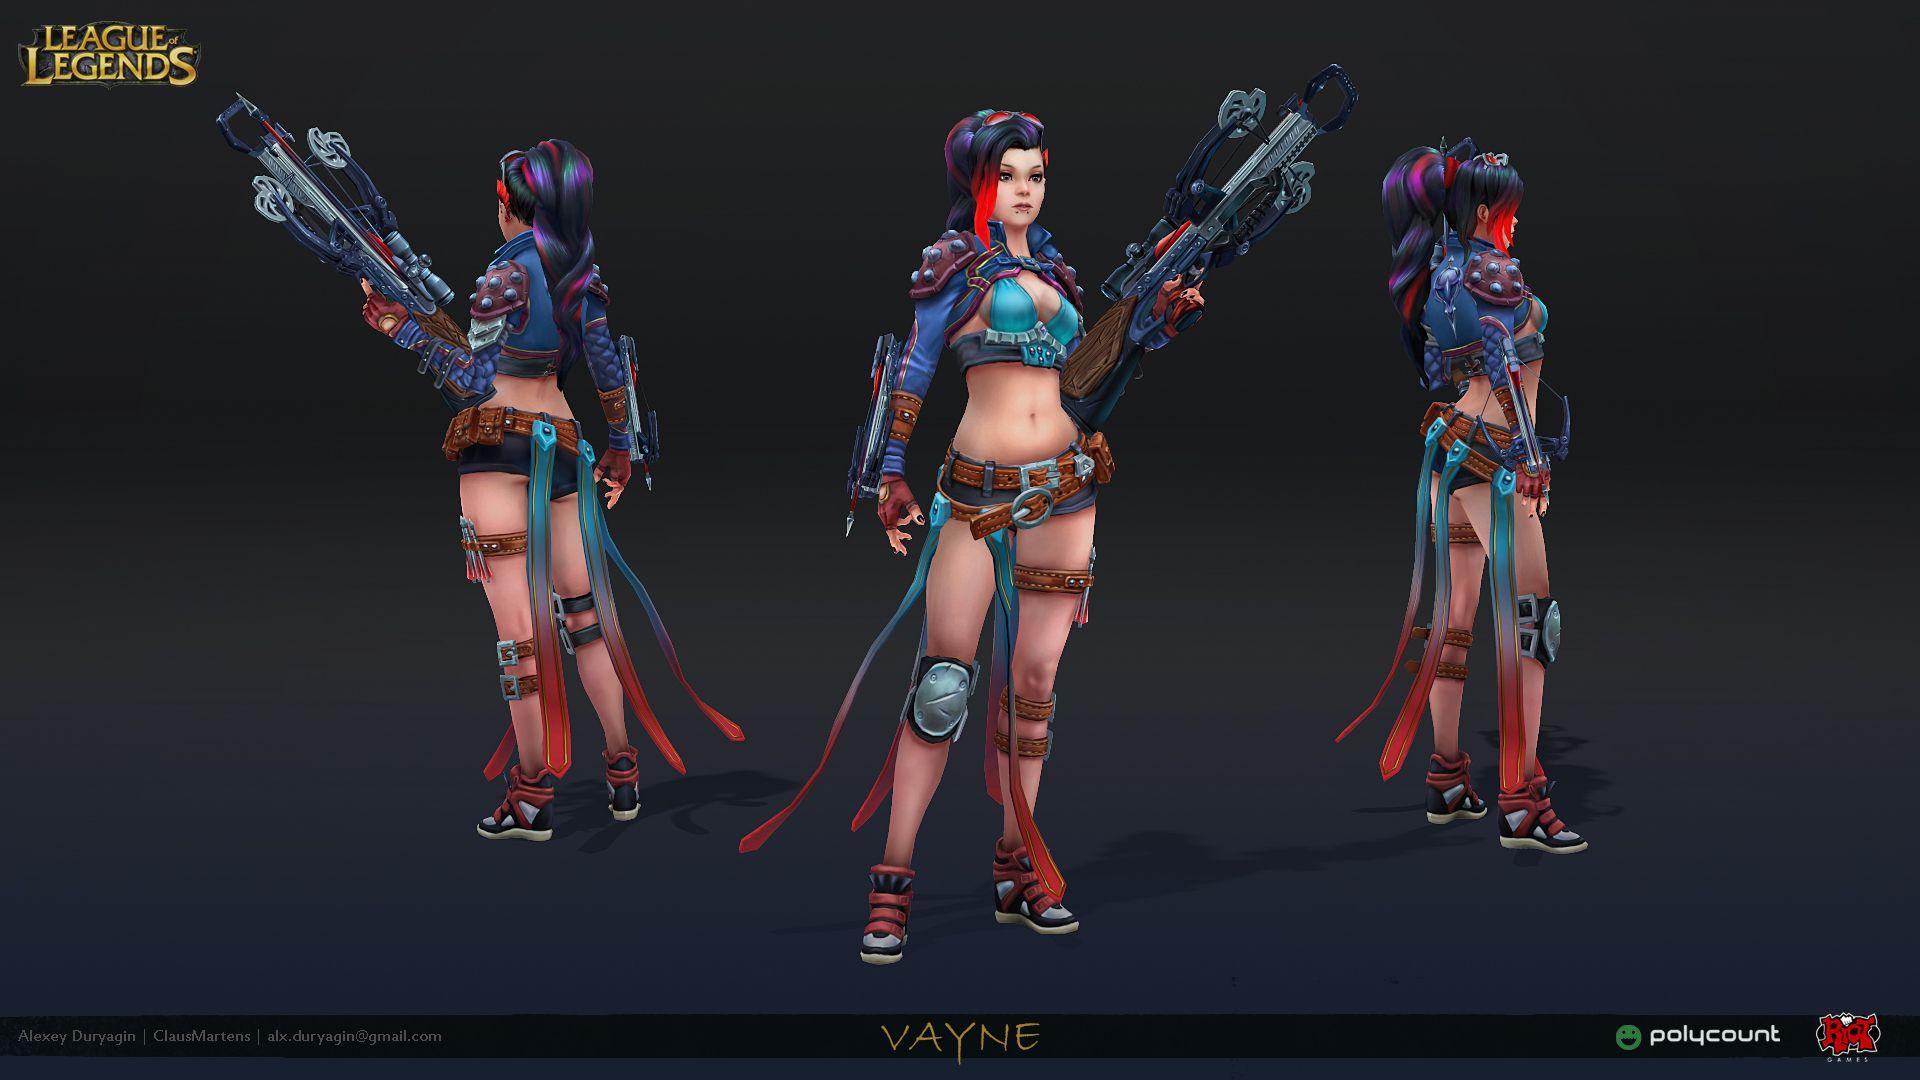 League Of Legends Character Design Contest : Riot art contest vayne polycount forum character